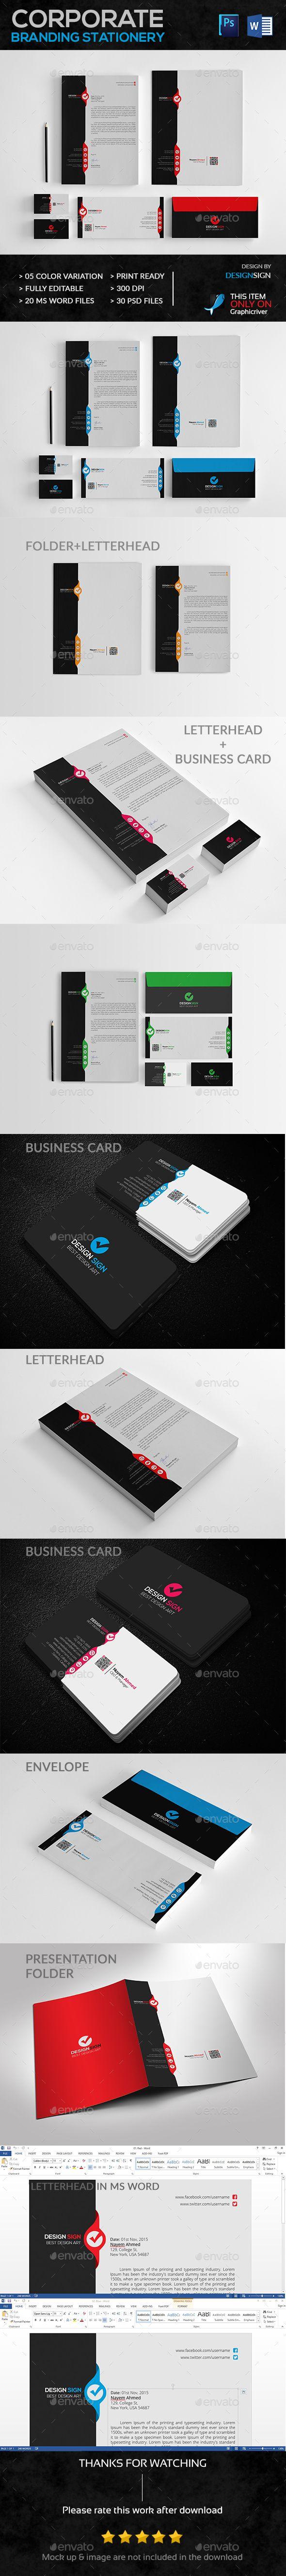 Corporate Branding Stationery Vol. 01